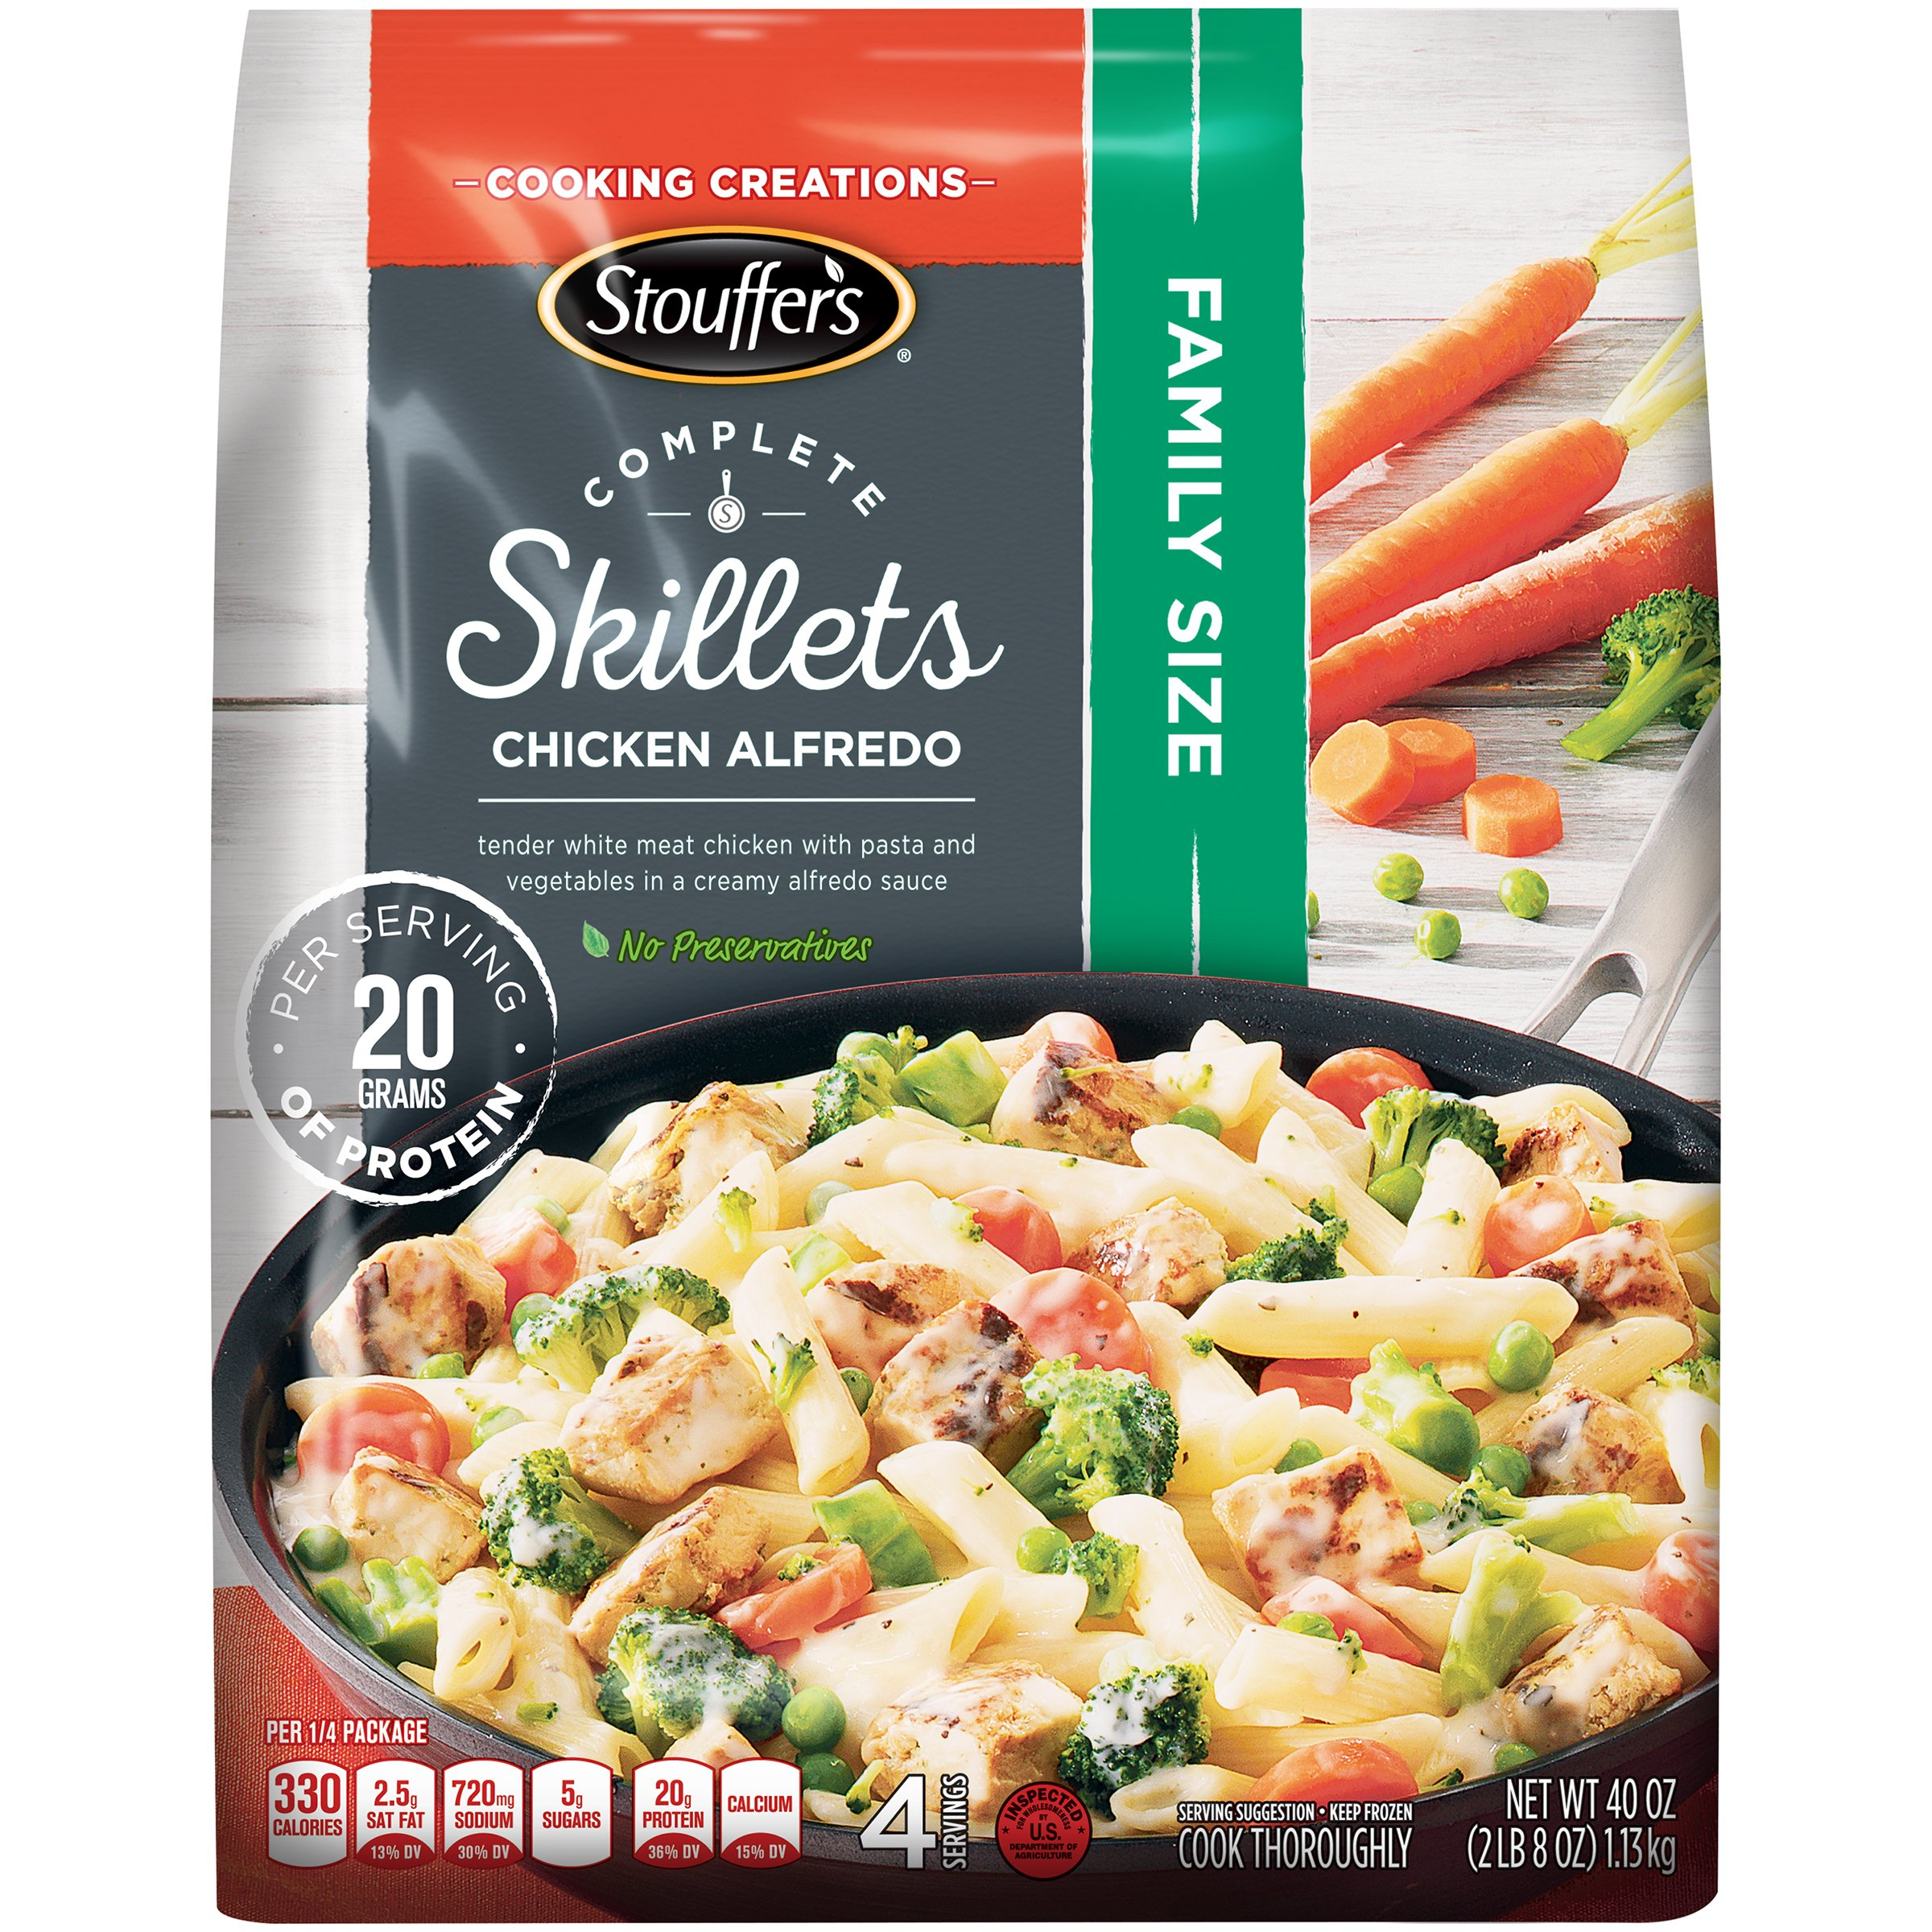 STOUFFER'S COMPLETE SKILLETS Family Size Chicken Alfredo 40 oz. Bag